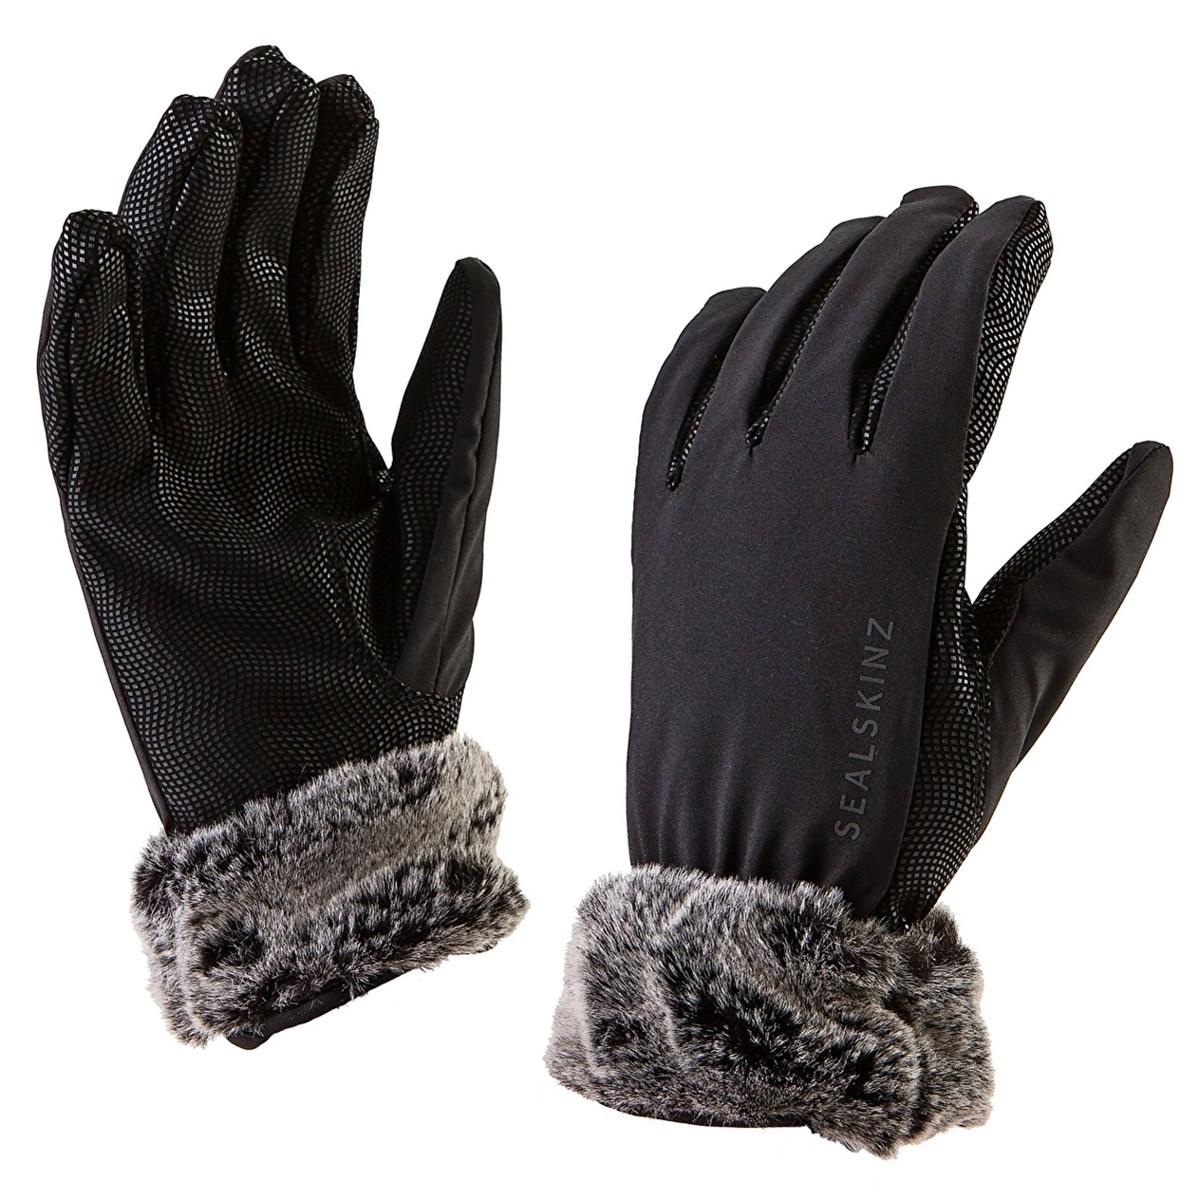 86f2c4316fddf Sealskinz Sea Leopard Lux Waterproof Ladies Gloves - Black Grey - Redpost  Equestrian